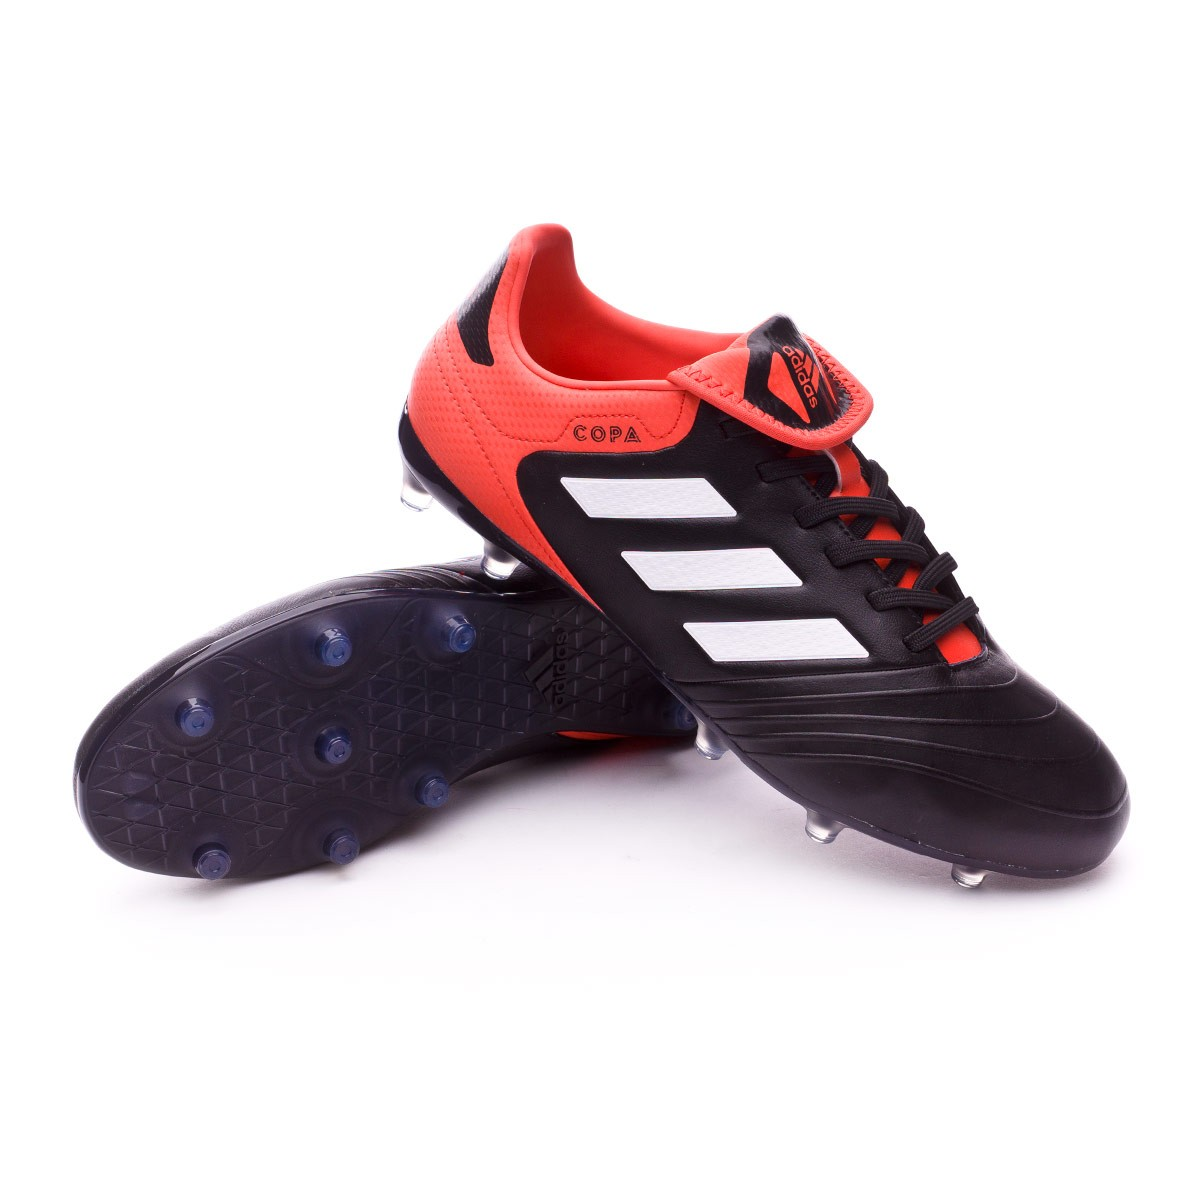 9867d89e1 Football Boots adidas Copa 18.3 FG Core black-White-Real coral ...